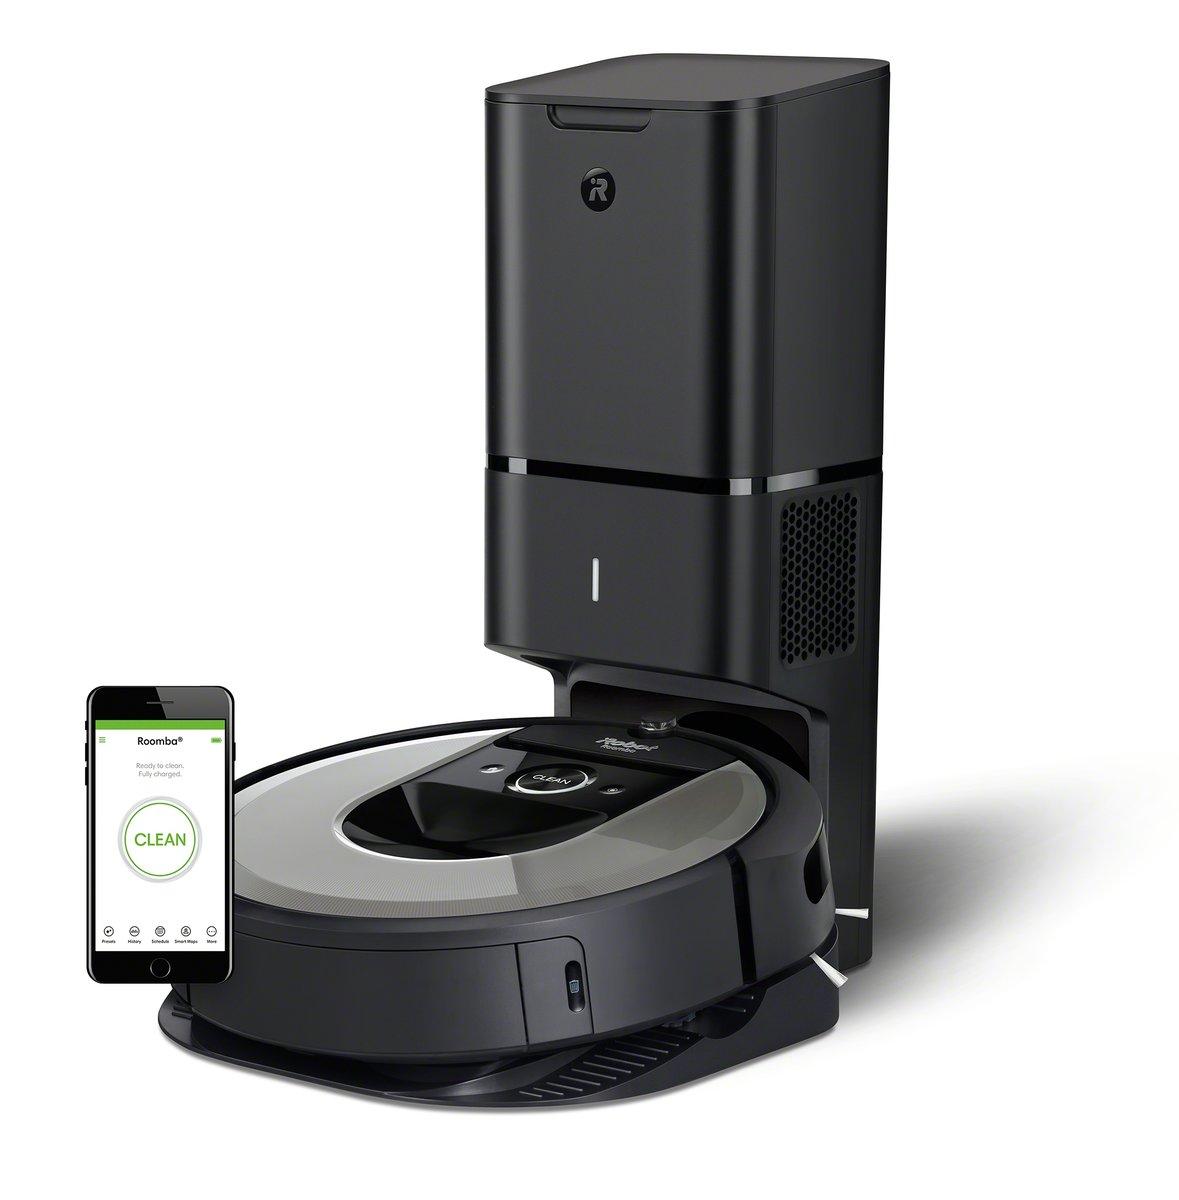 Roomba i7+ 吸塵機械人 + 自動髒污處理【香港行貨】